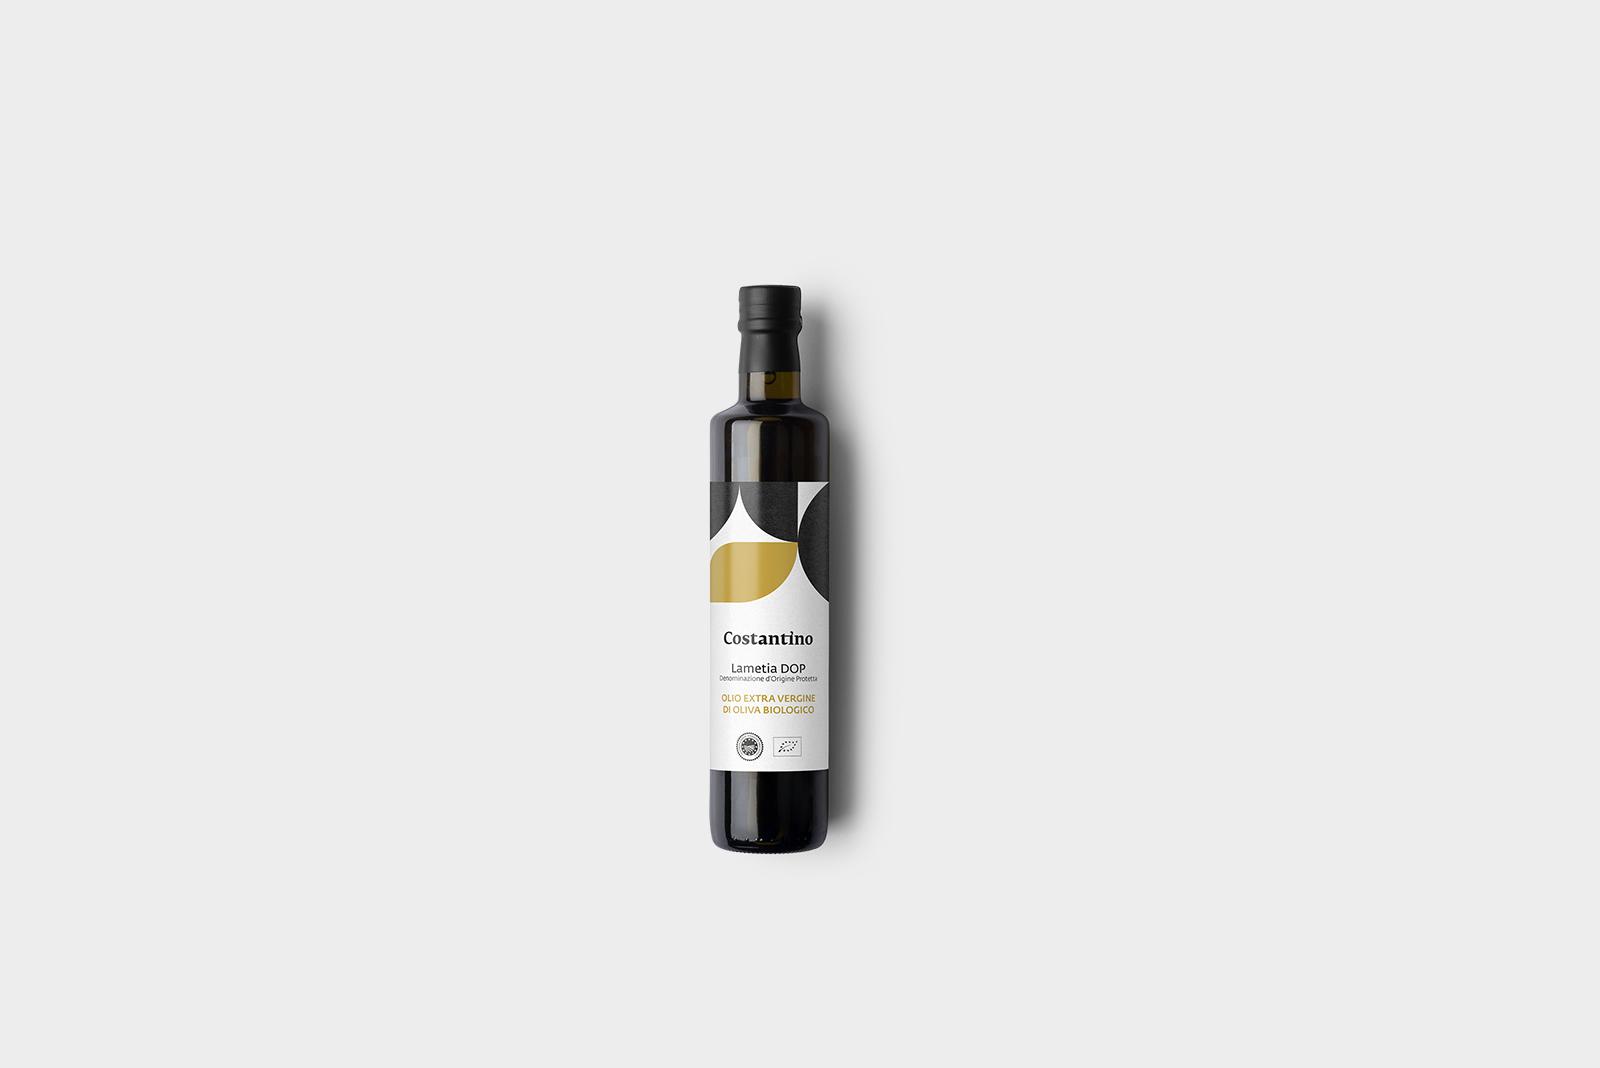 Costantino - Olio Extra Vergine d'Oliva Biologico Dop Lamezia - bottiglia 10cl